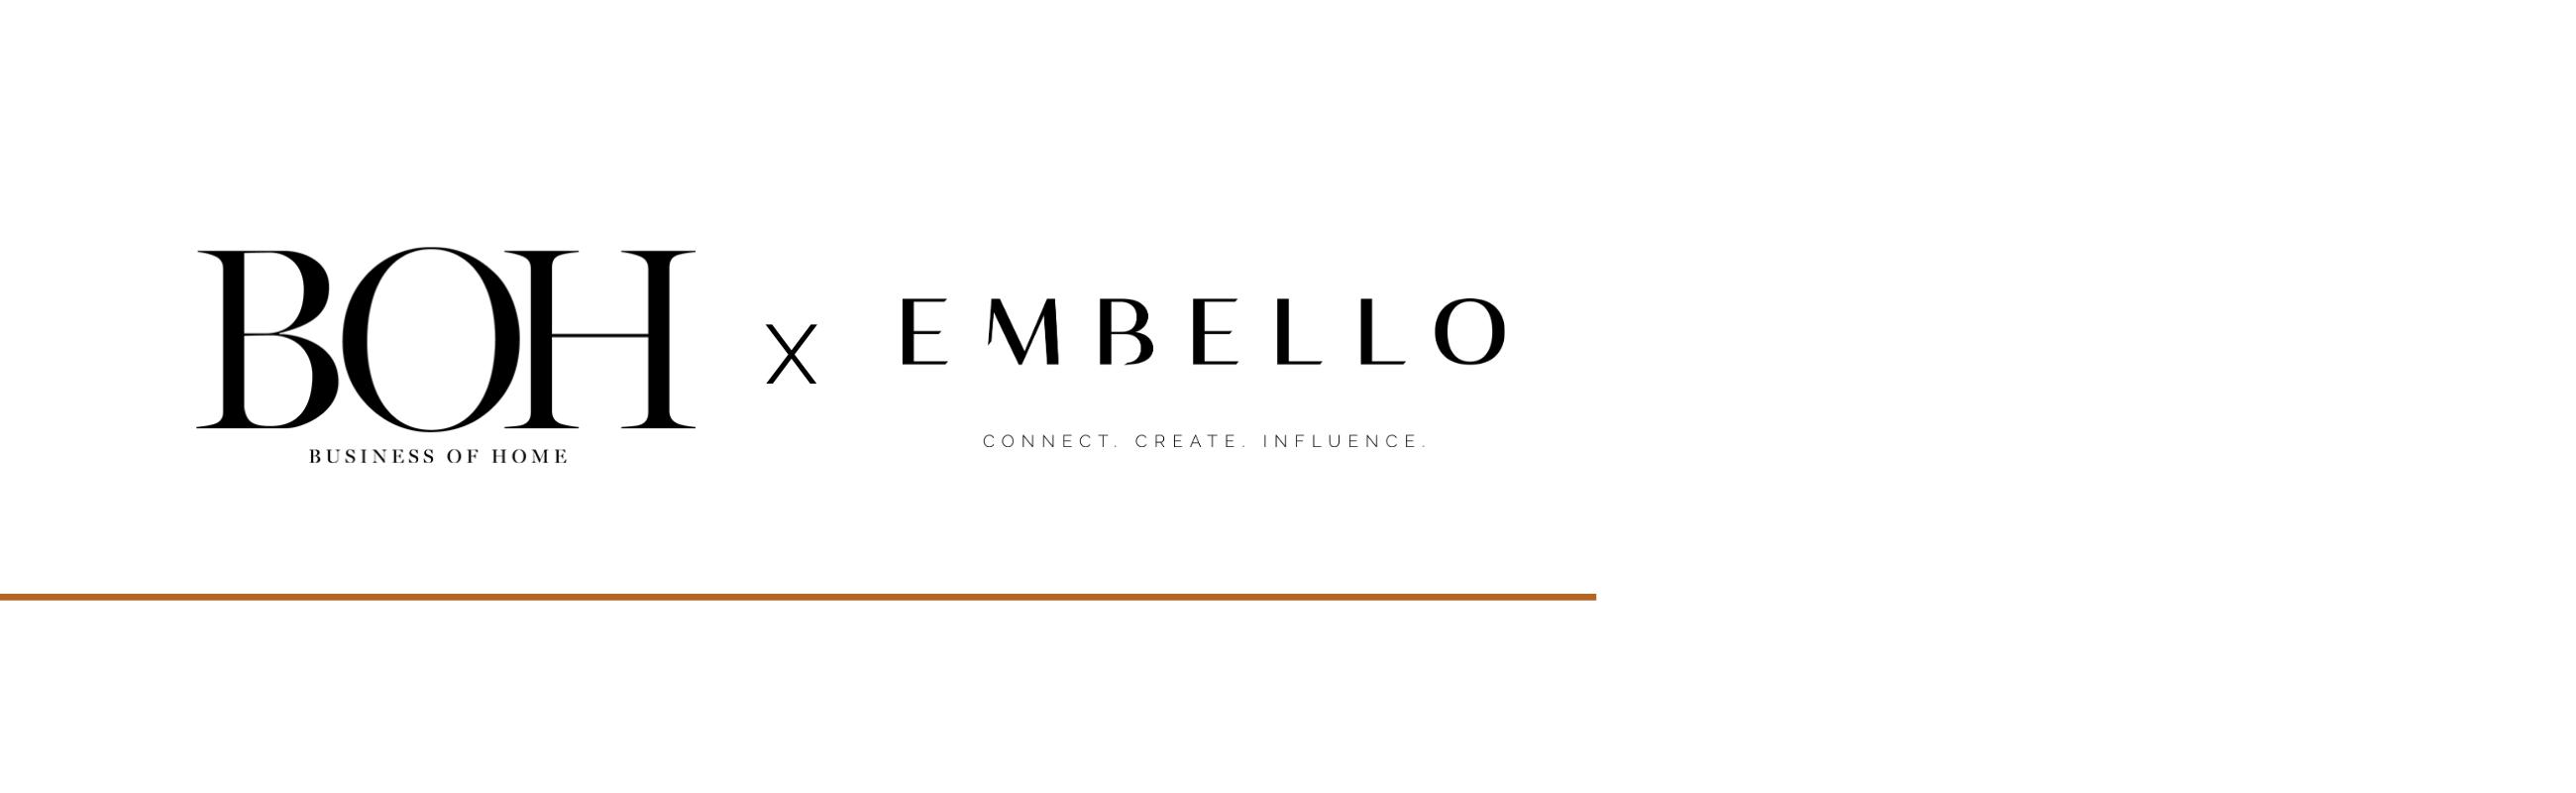 business of home embello webinar